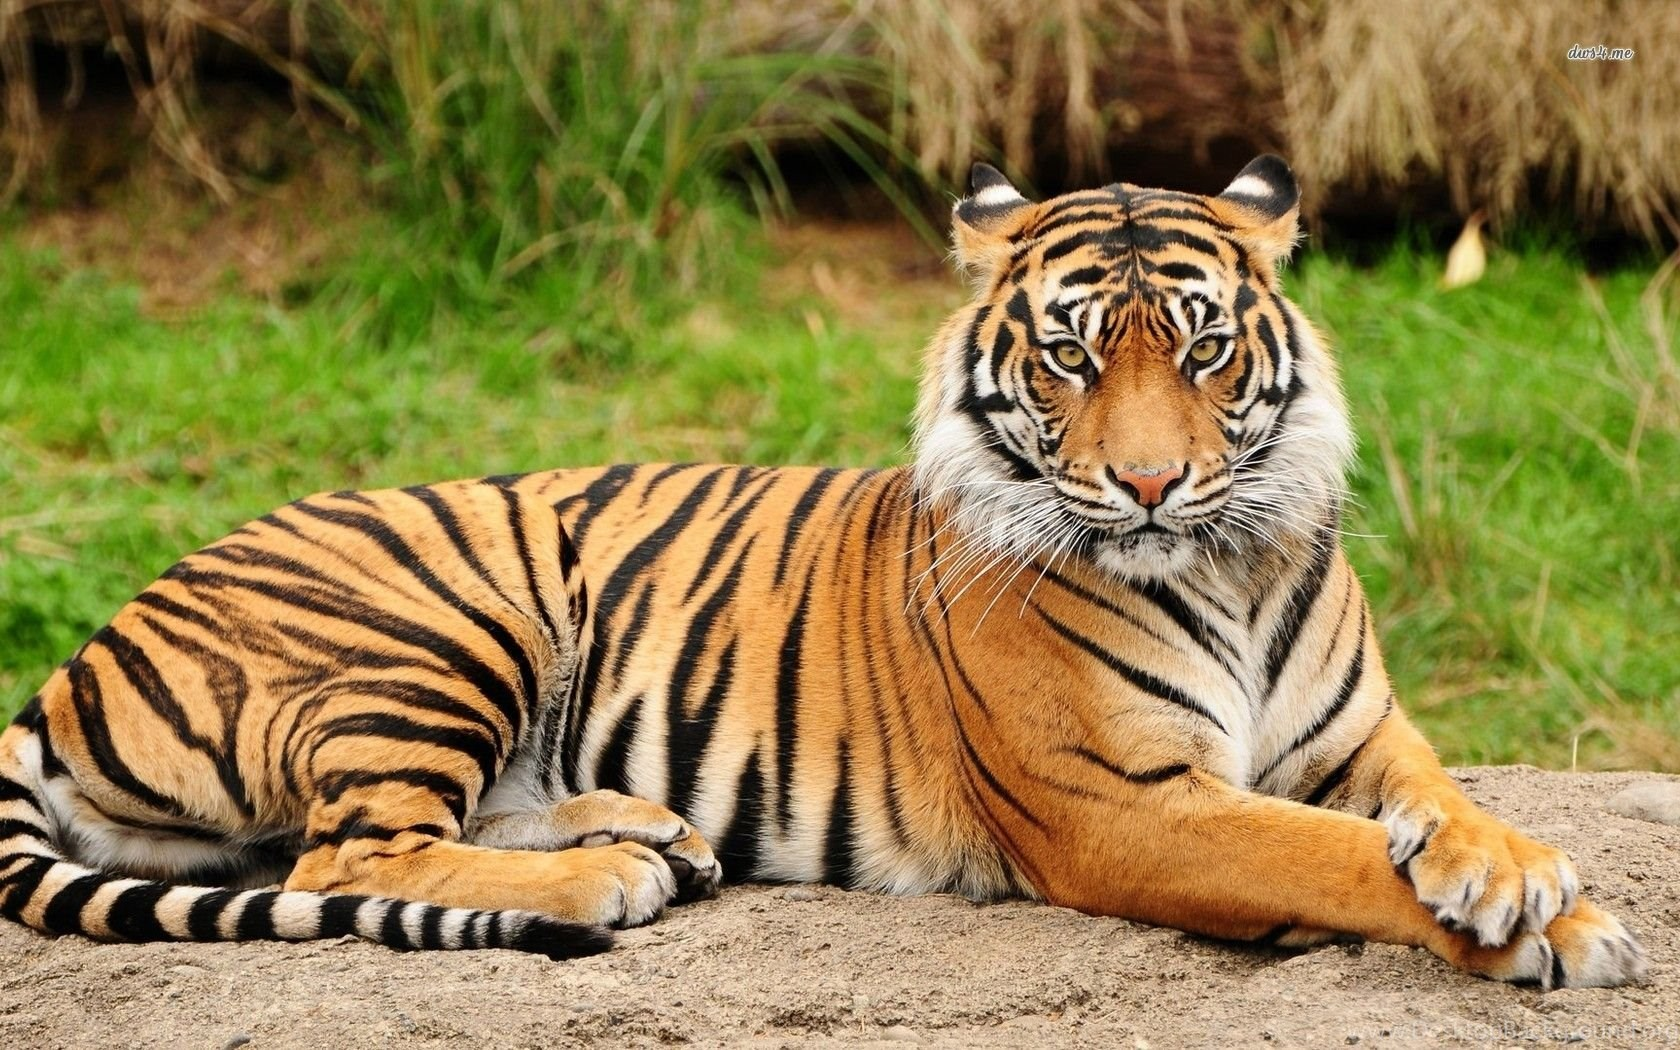 Download Cool Hd Animal Tiger Wallpaper Backgrounds In Animals ... Desktop  Background